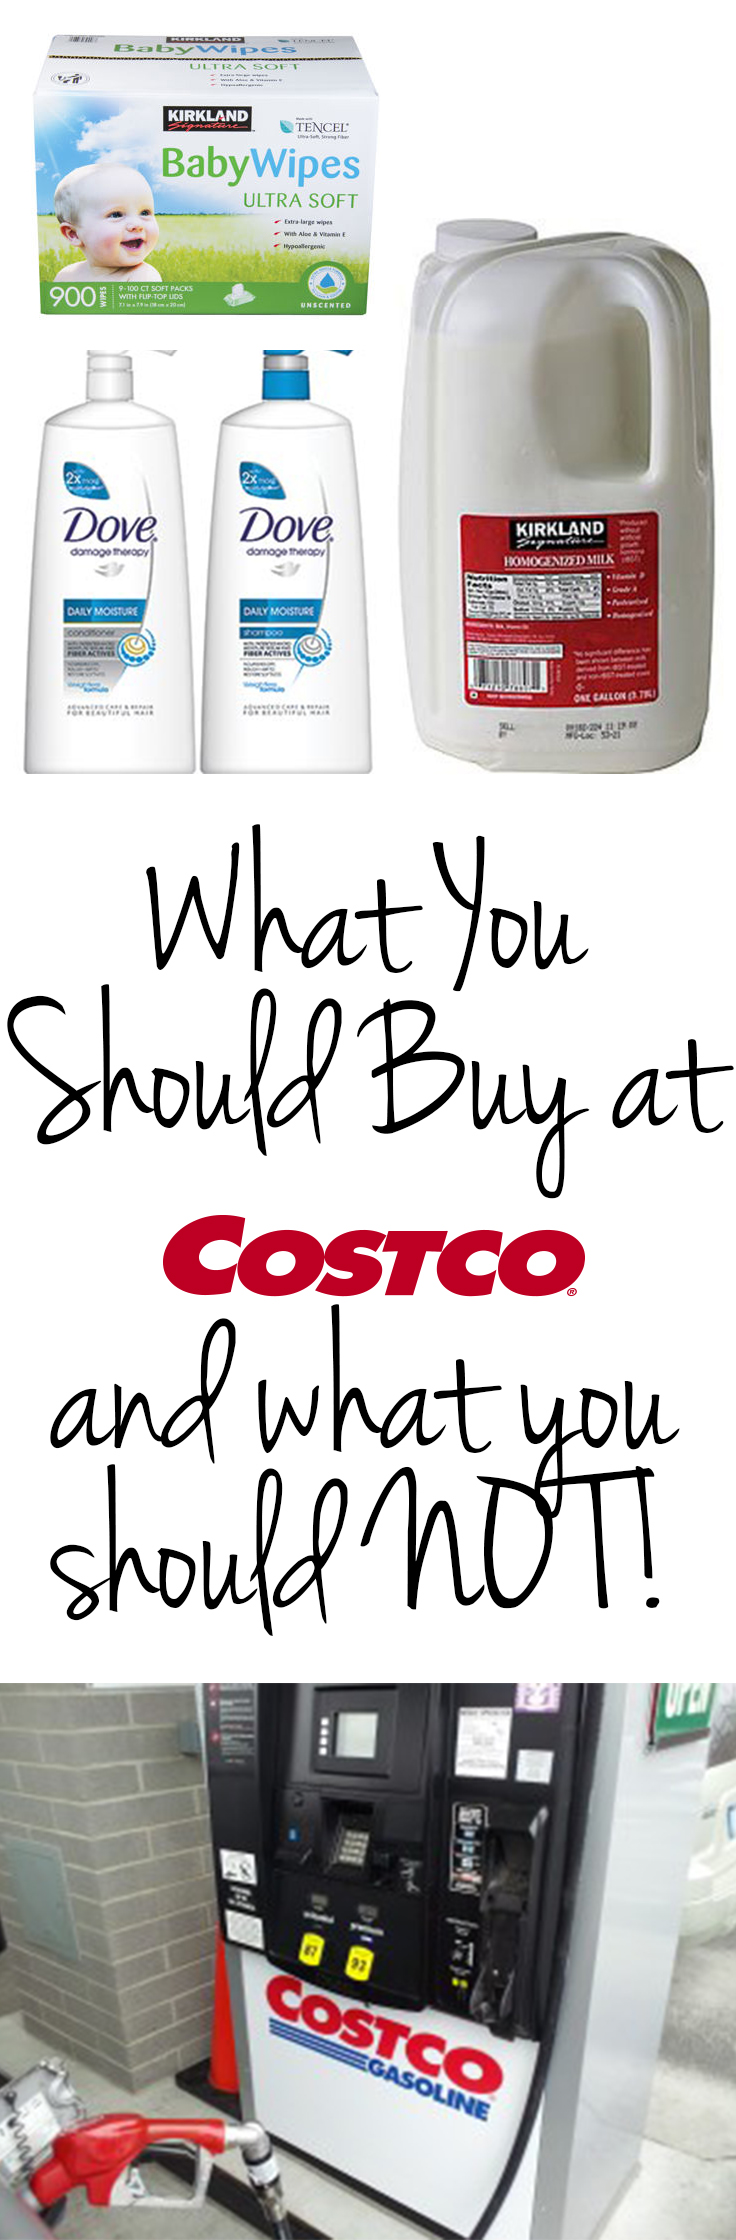 Costco, Costco shopping hacks, popular pin, shopping hacks, save money at Costco, Costco shopping.